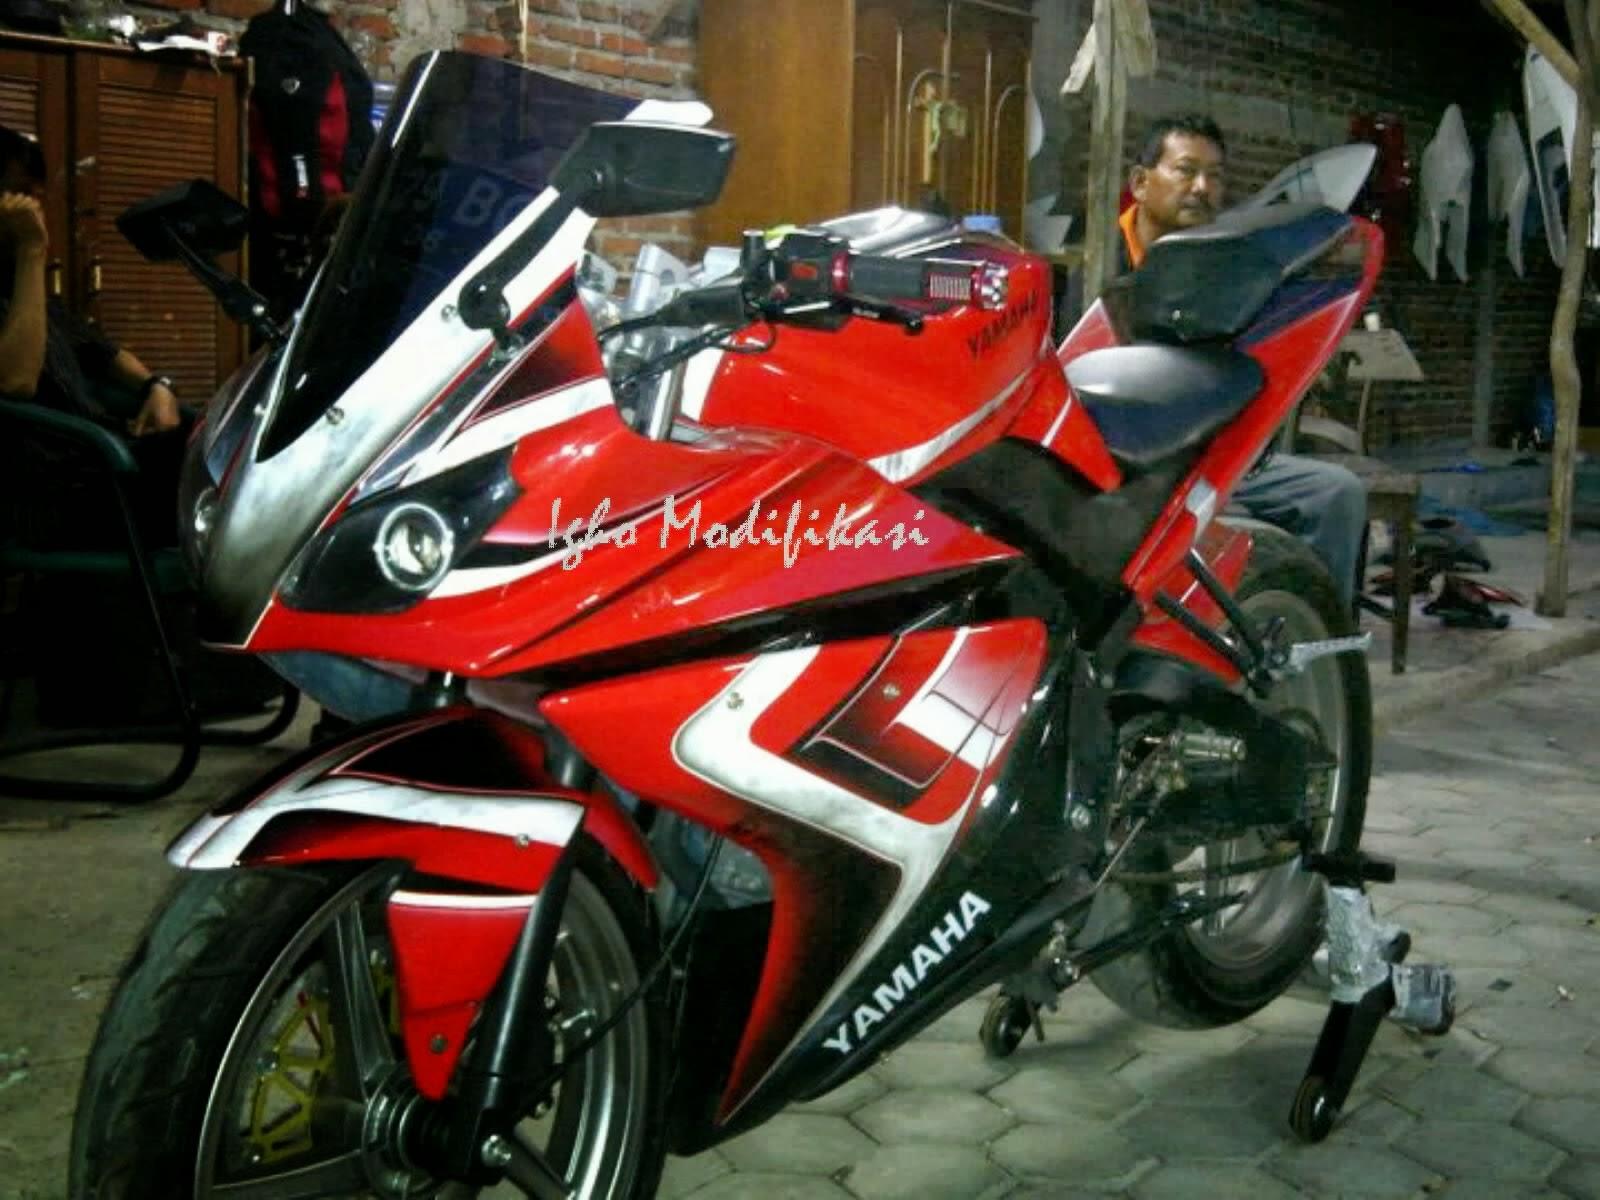 Modif Yamaha Vixion Di Bandung